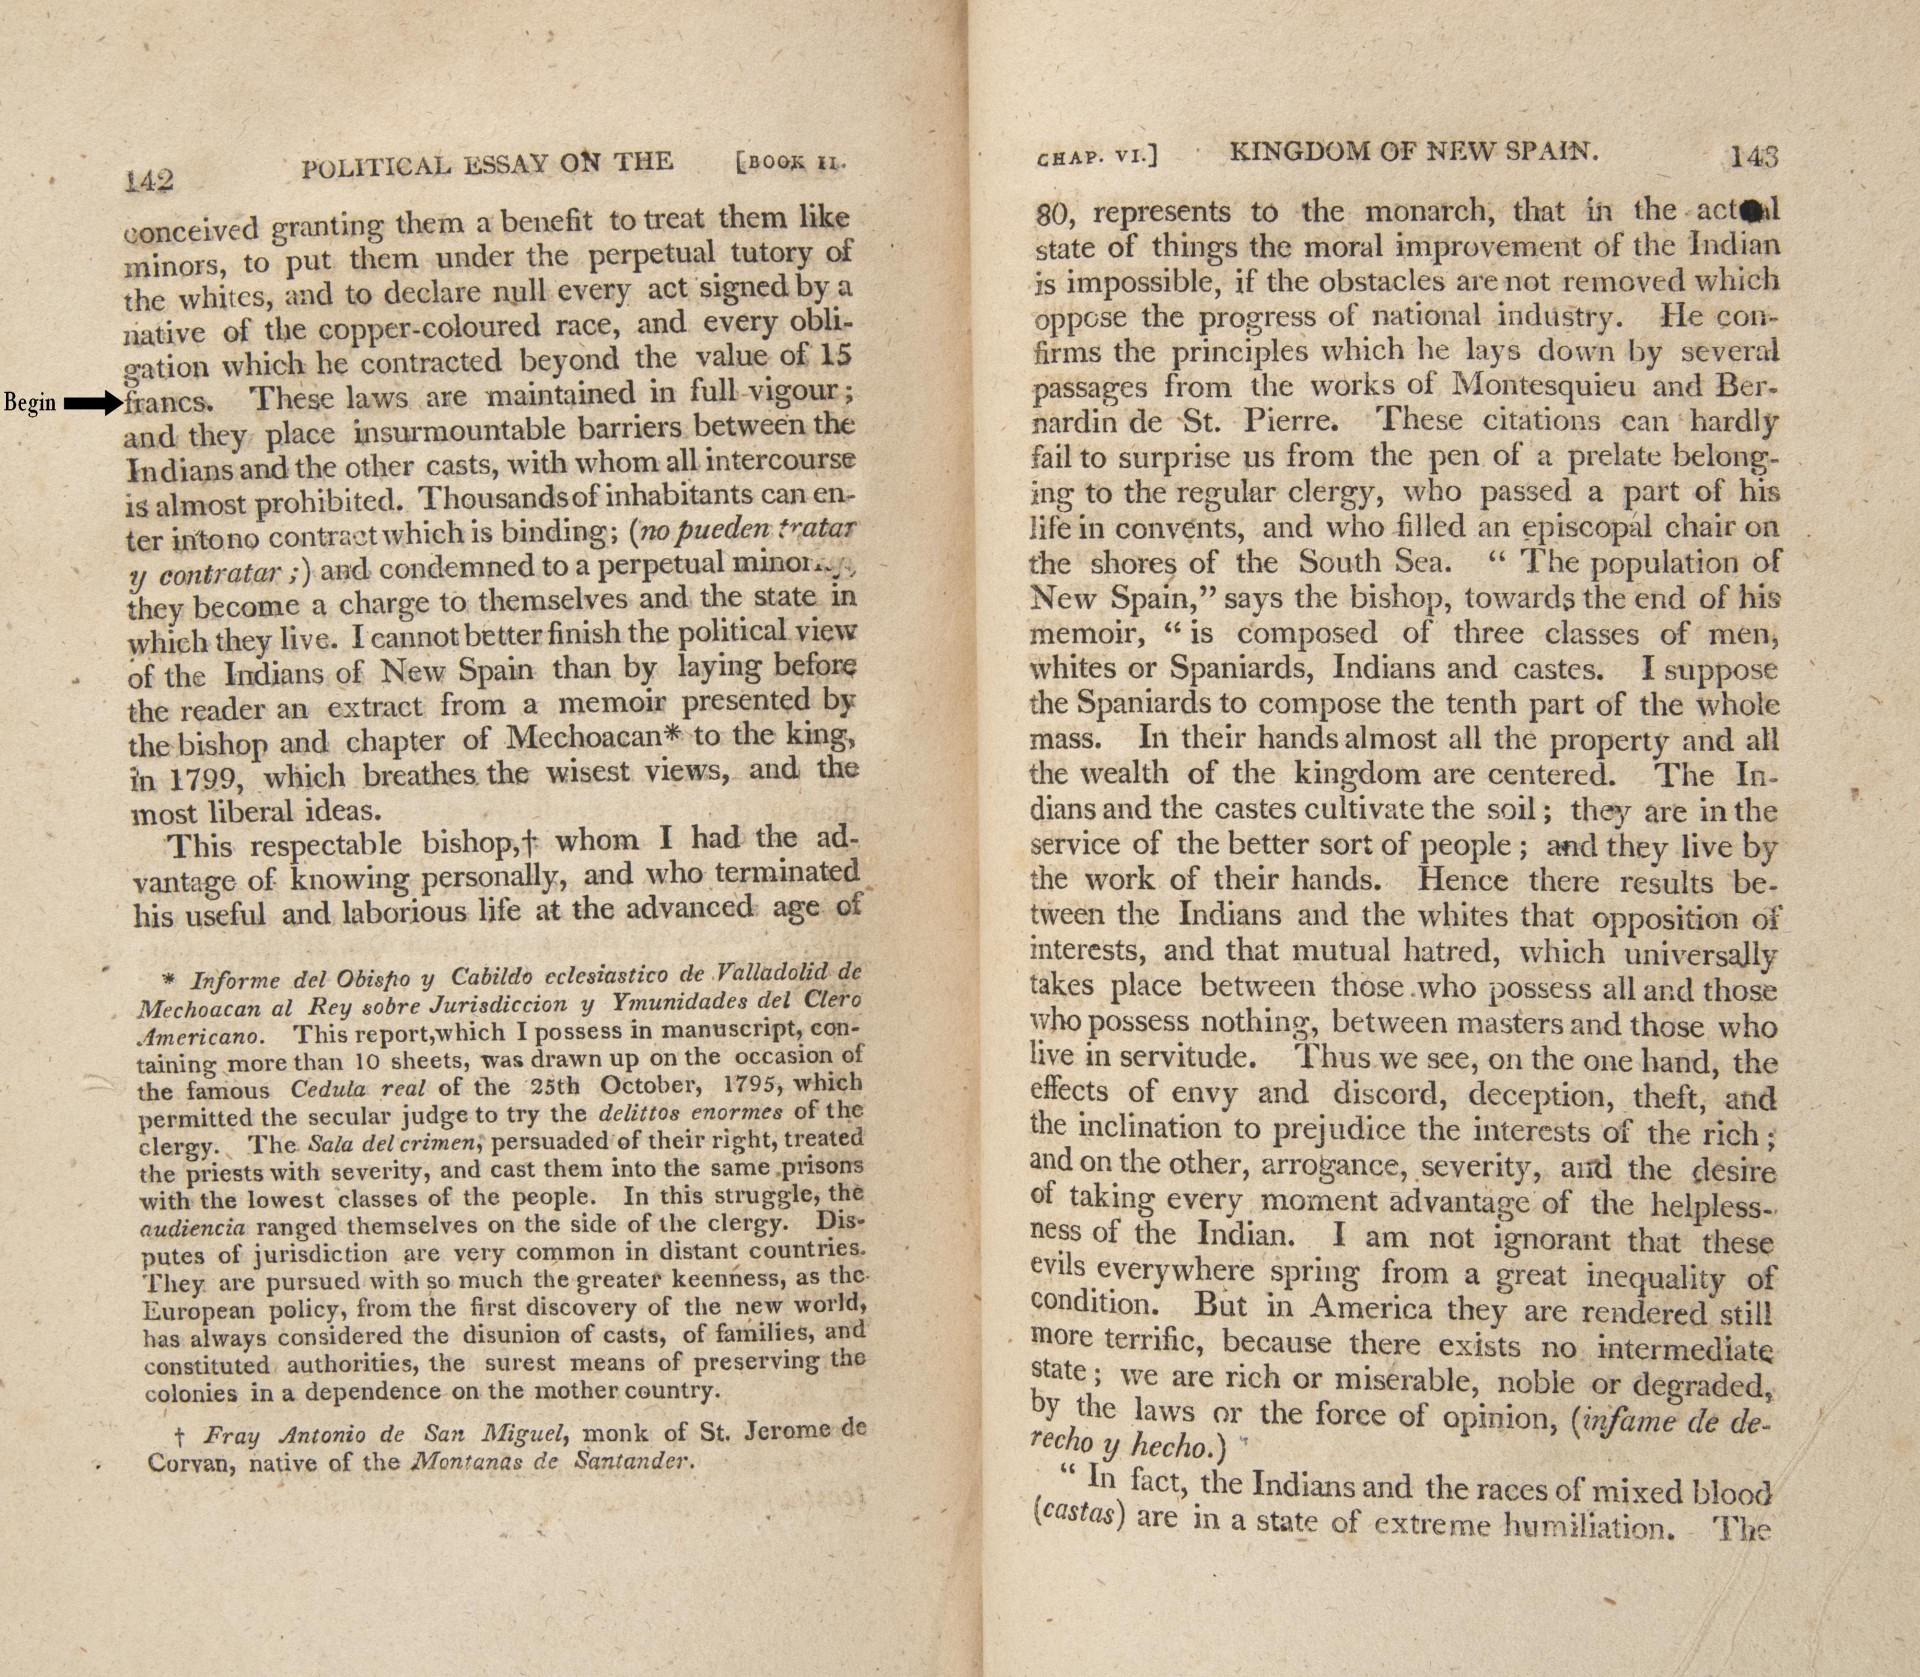 018 Von Humboldt Political Essay Pp142 143 Mod Example Dreaded Crossword Puzzle Clue 1920